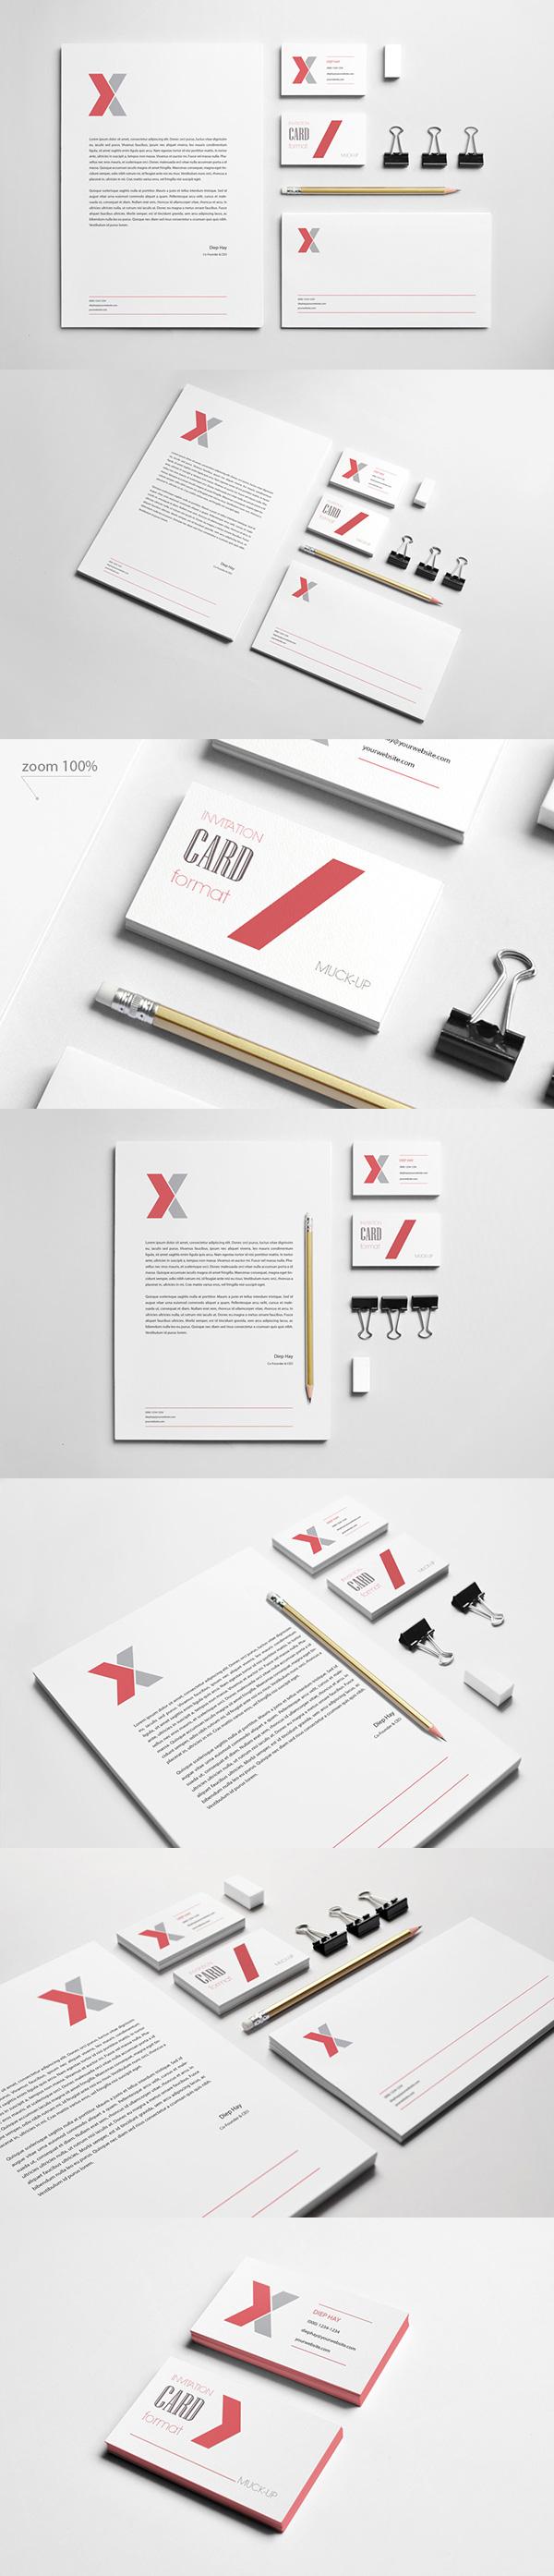 10 Branding : Stationery Mock-Up